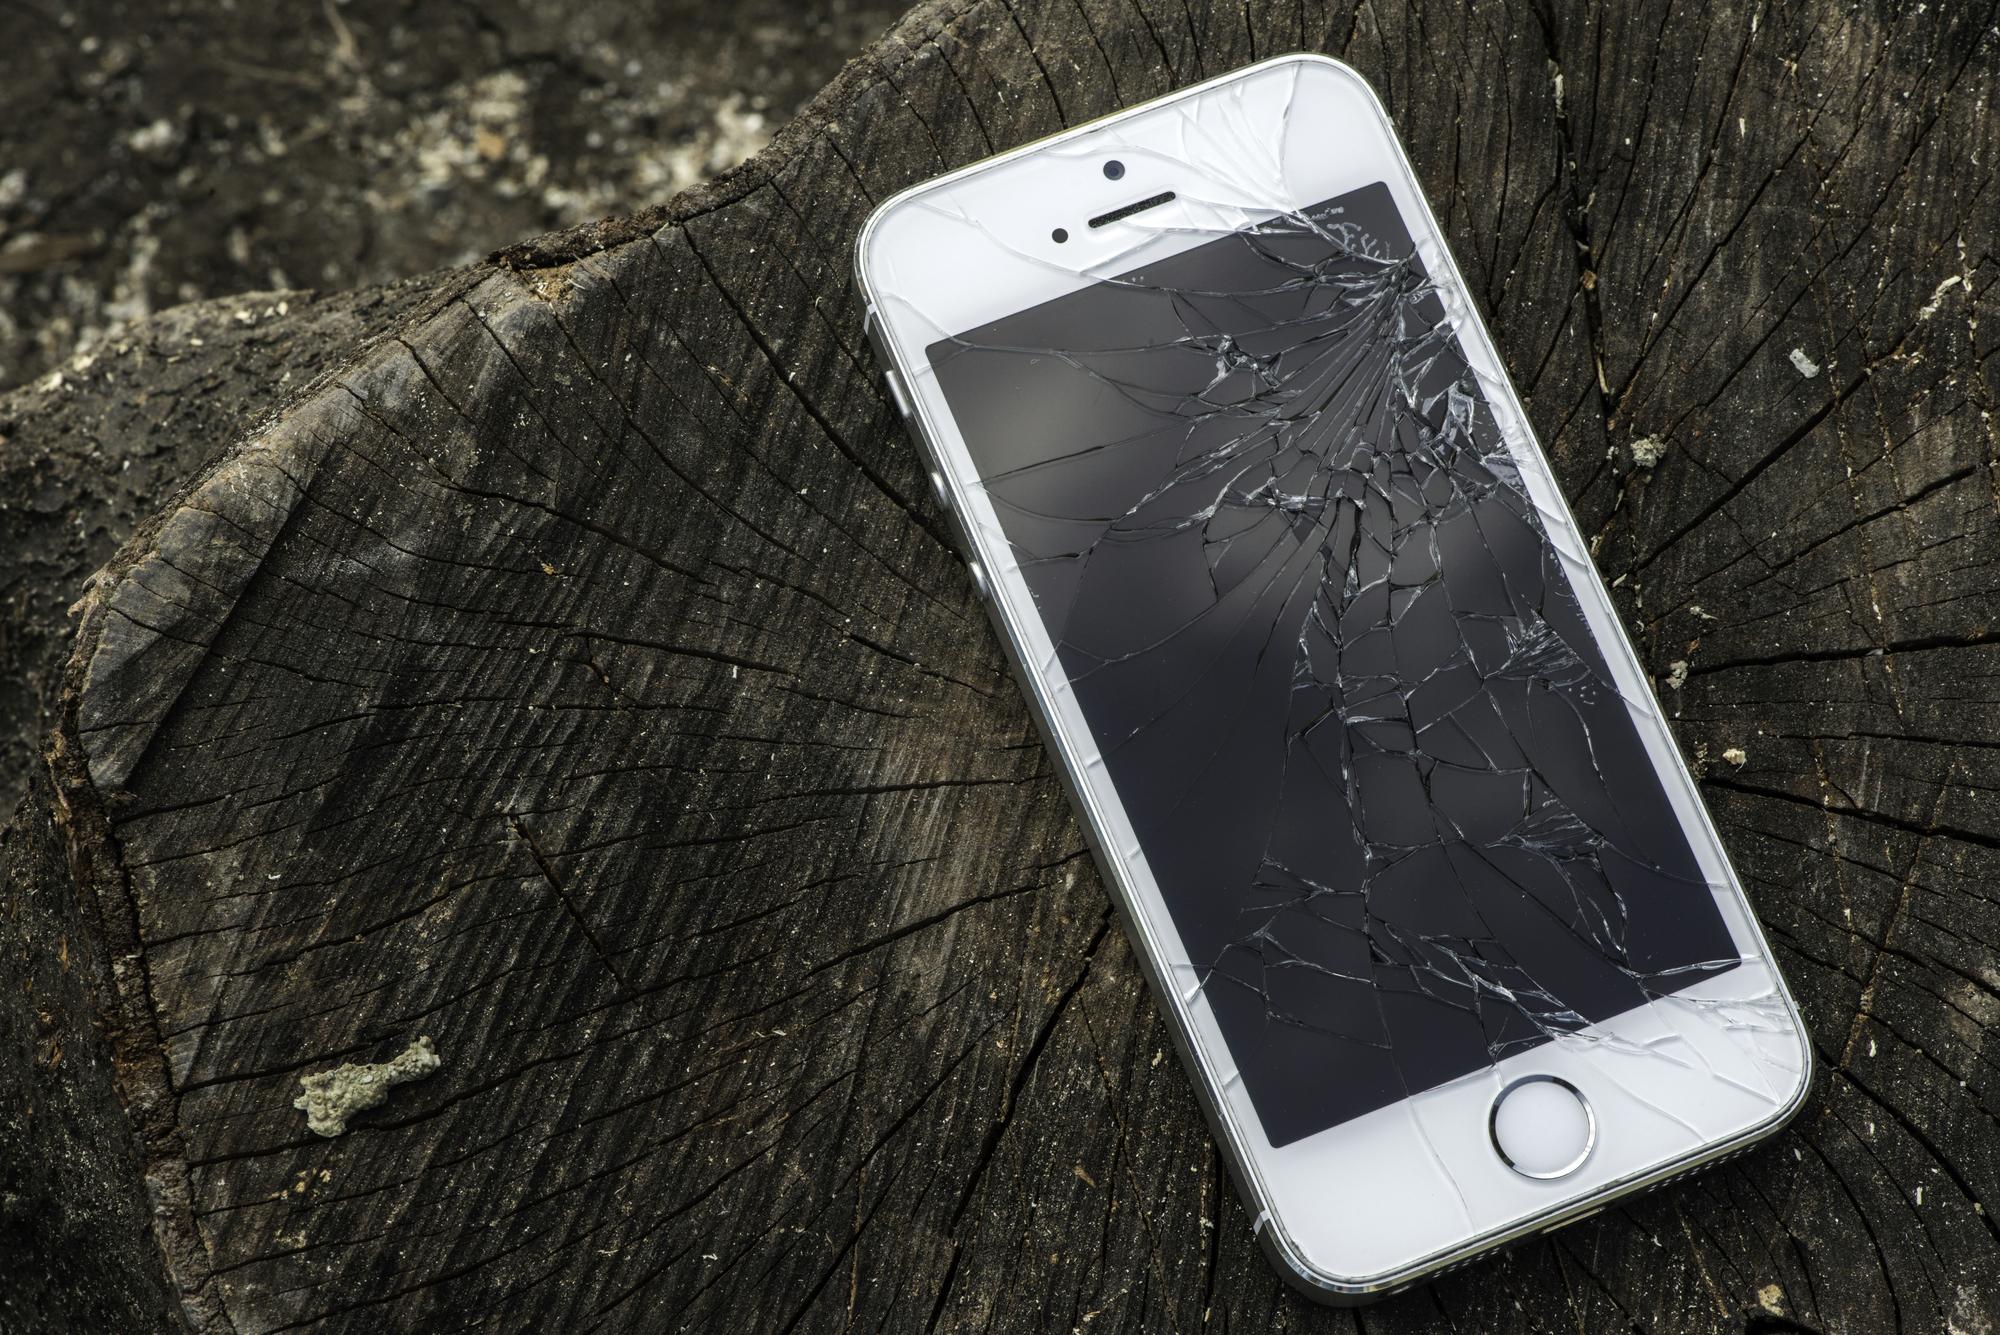 iPhone er gået i stykker